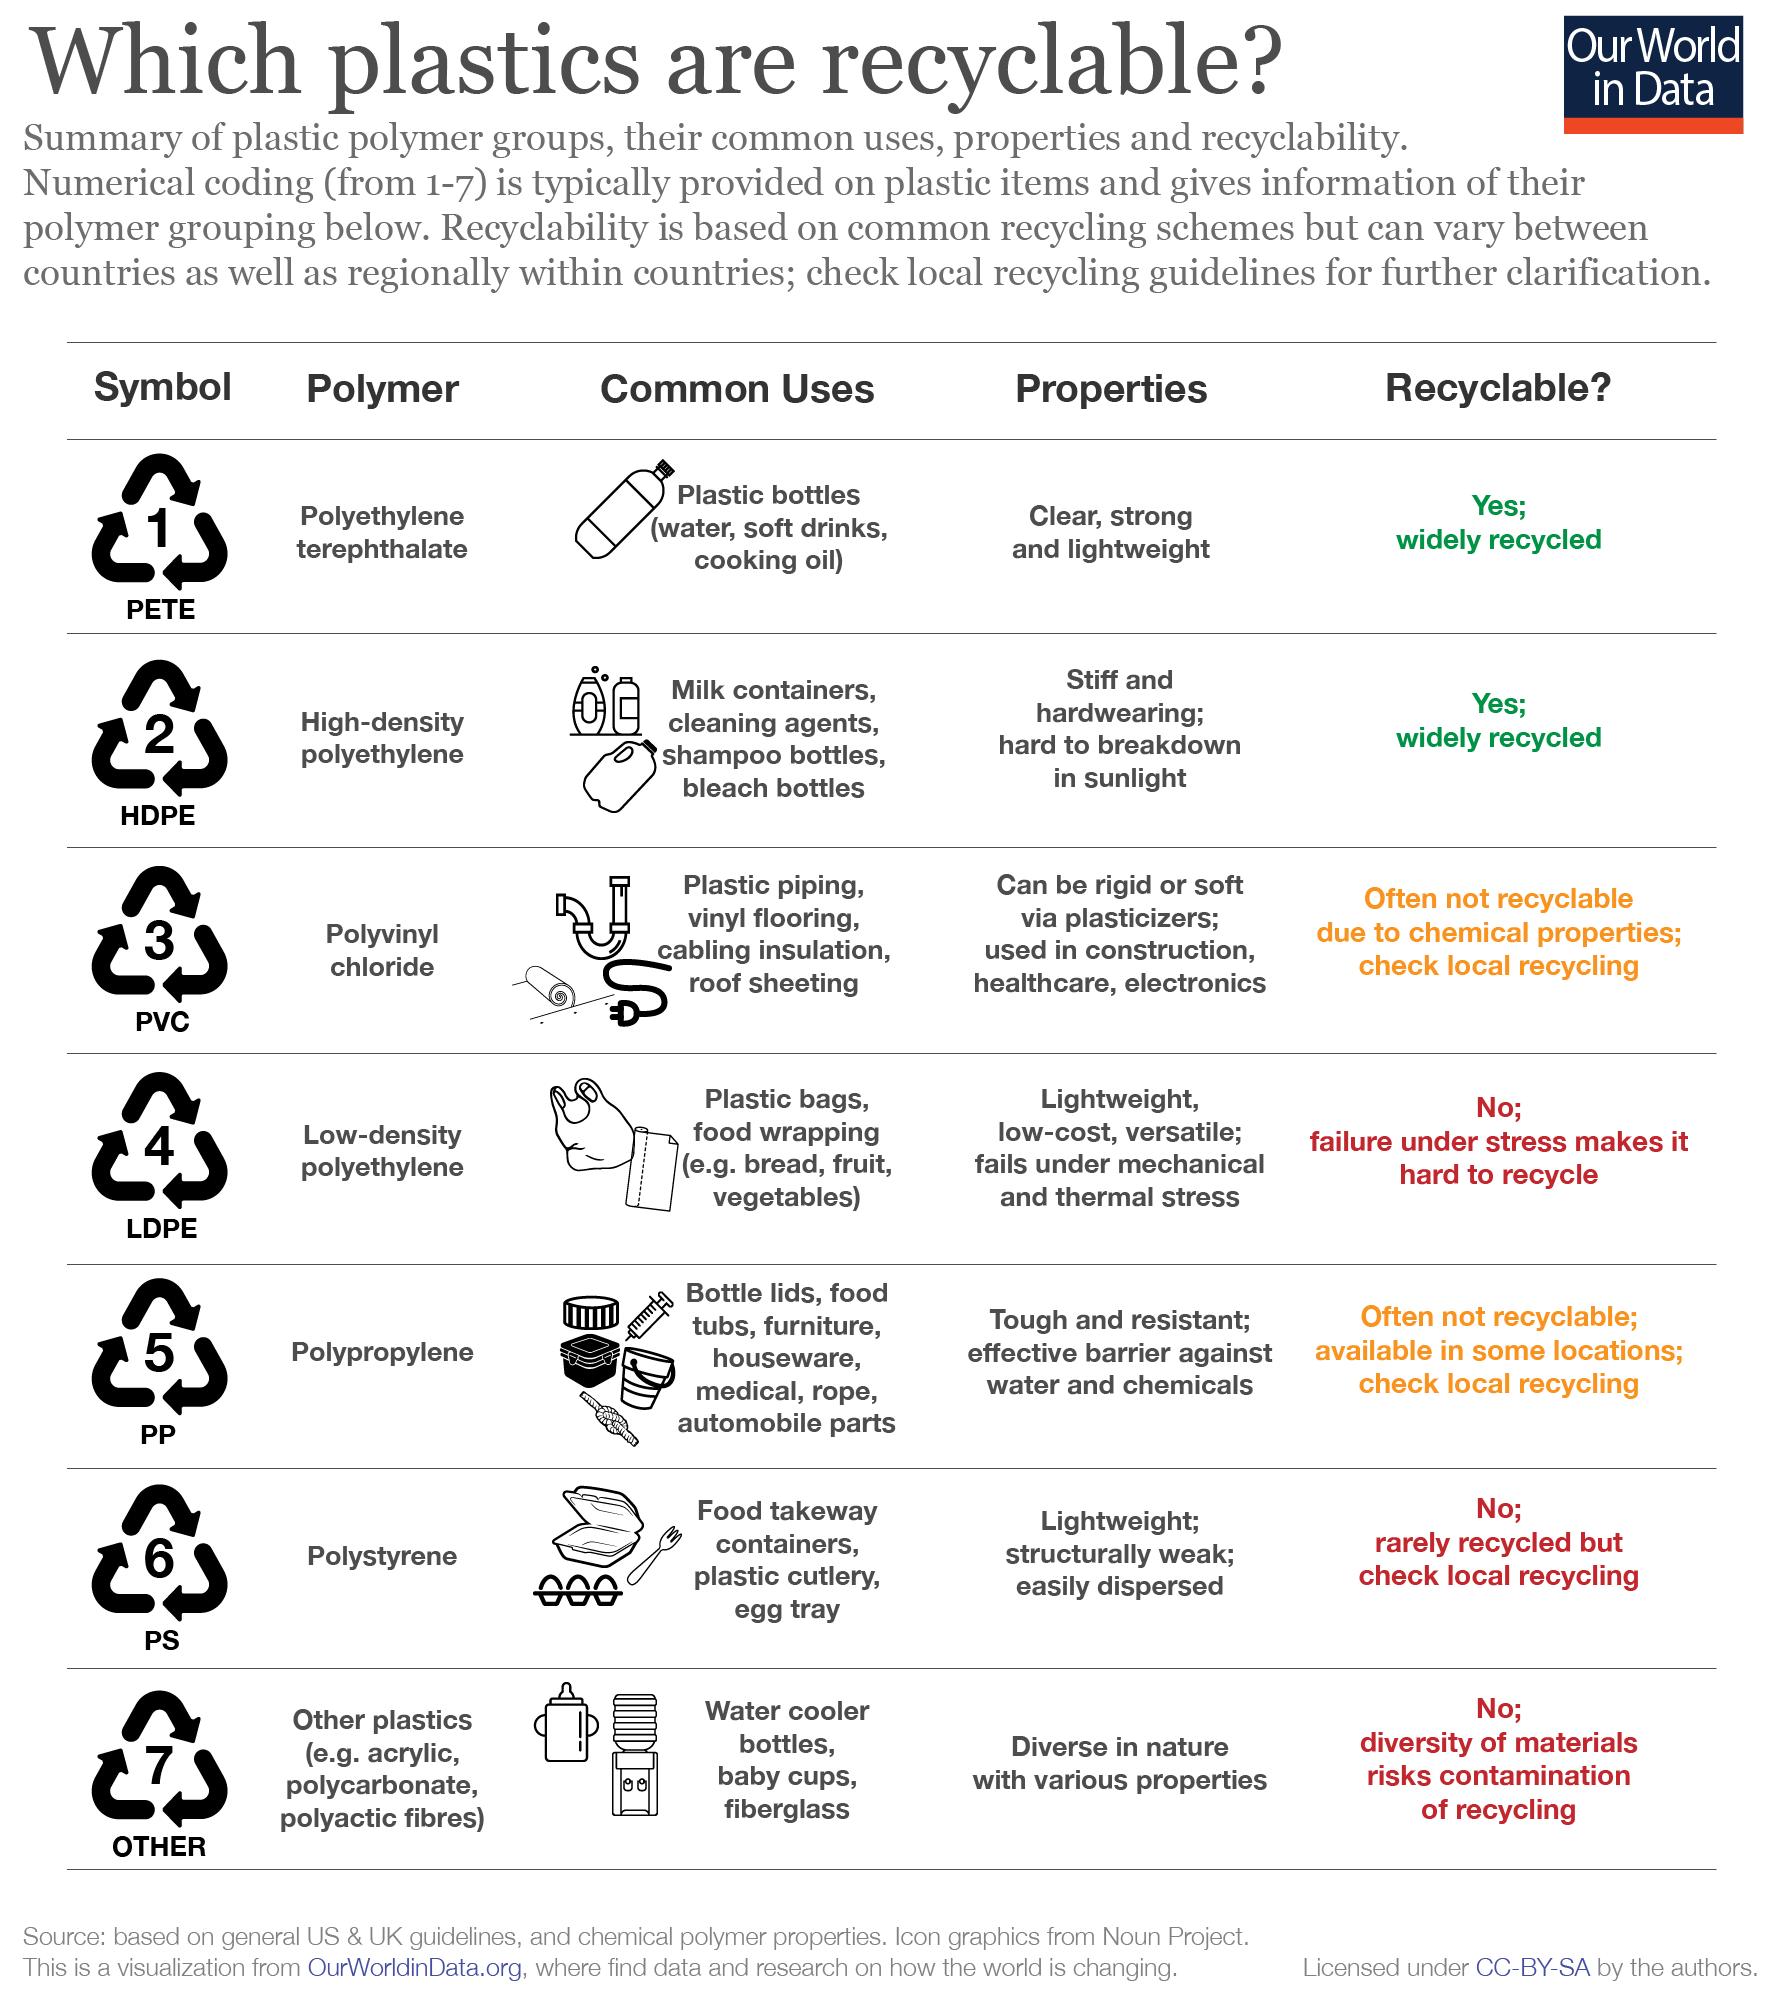 Plastics-by-polymer-type-01